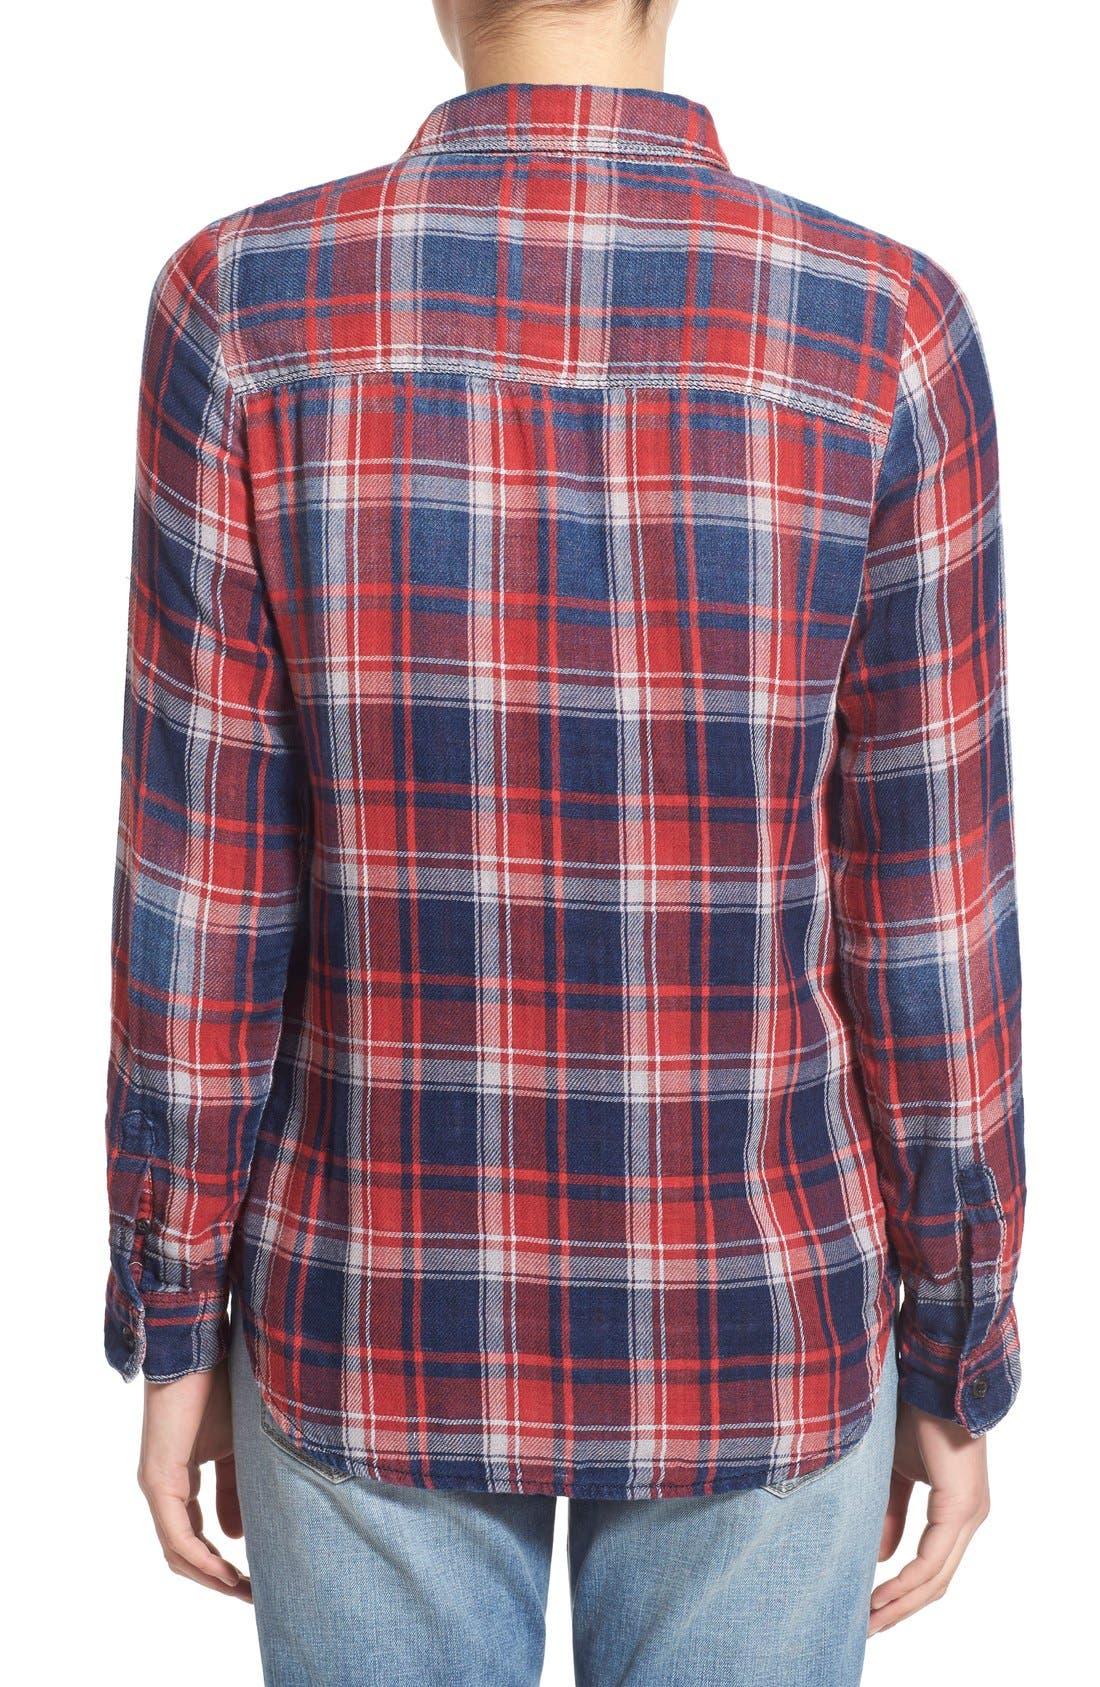 Treasure&Bond Classic Fit Plaid Shirt,                             Alternate thumbnail 2, color,                             Navy Indigo Red Tartan